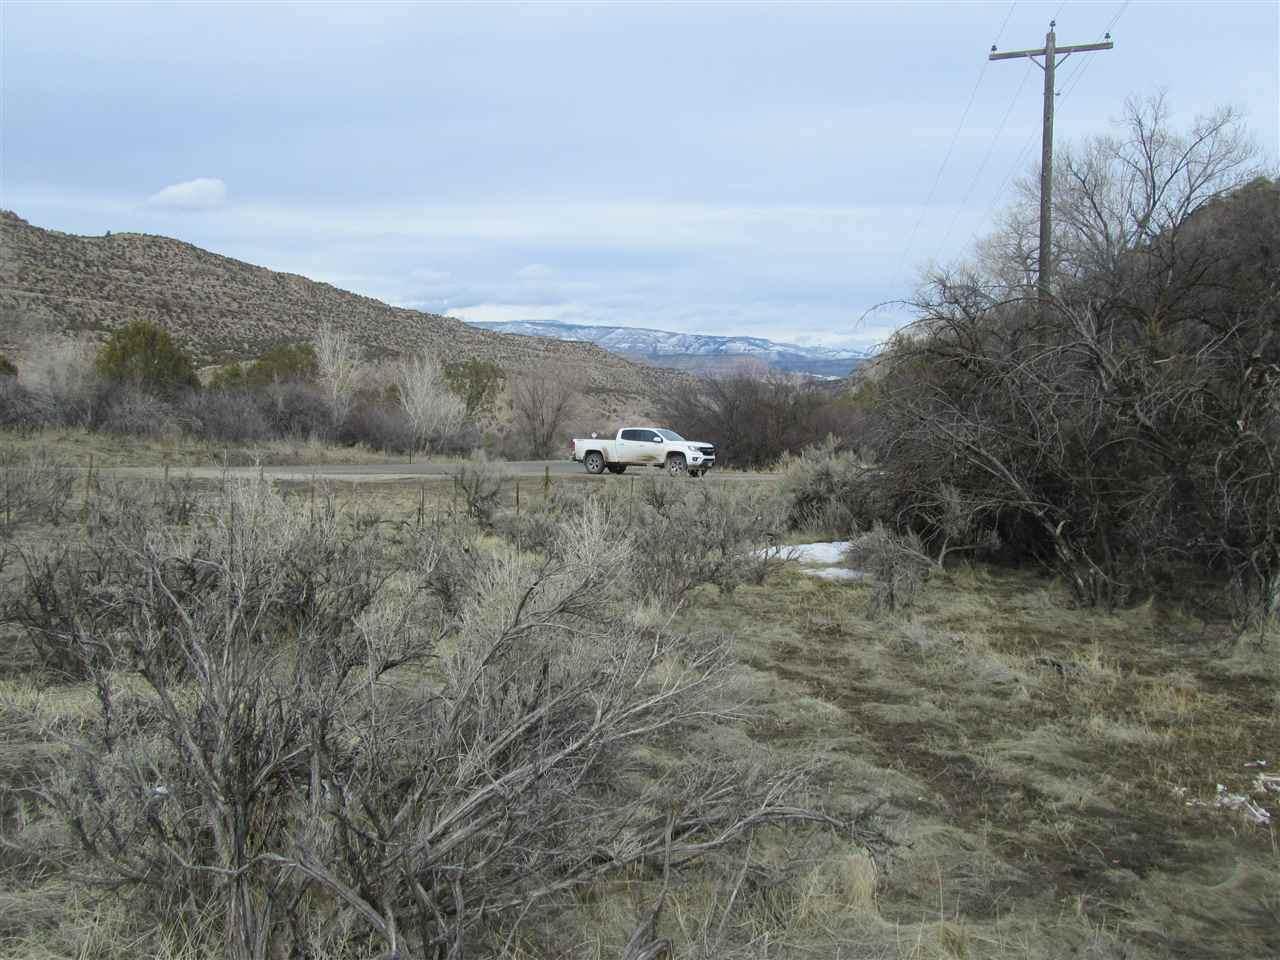 TBD Highway 330 - Photo 1